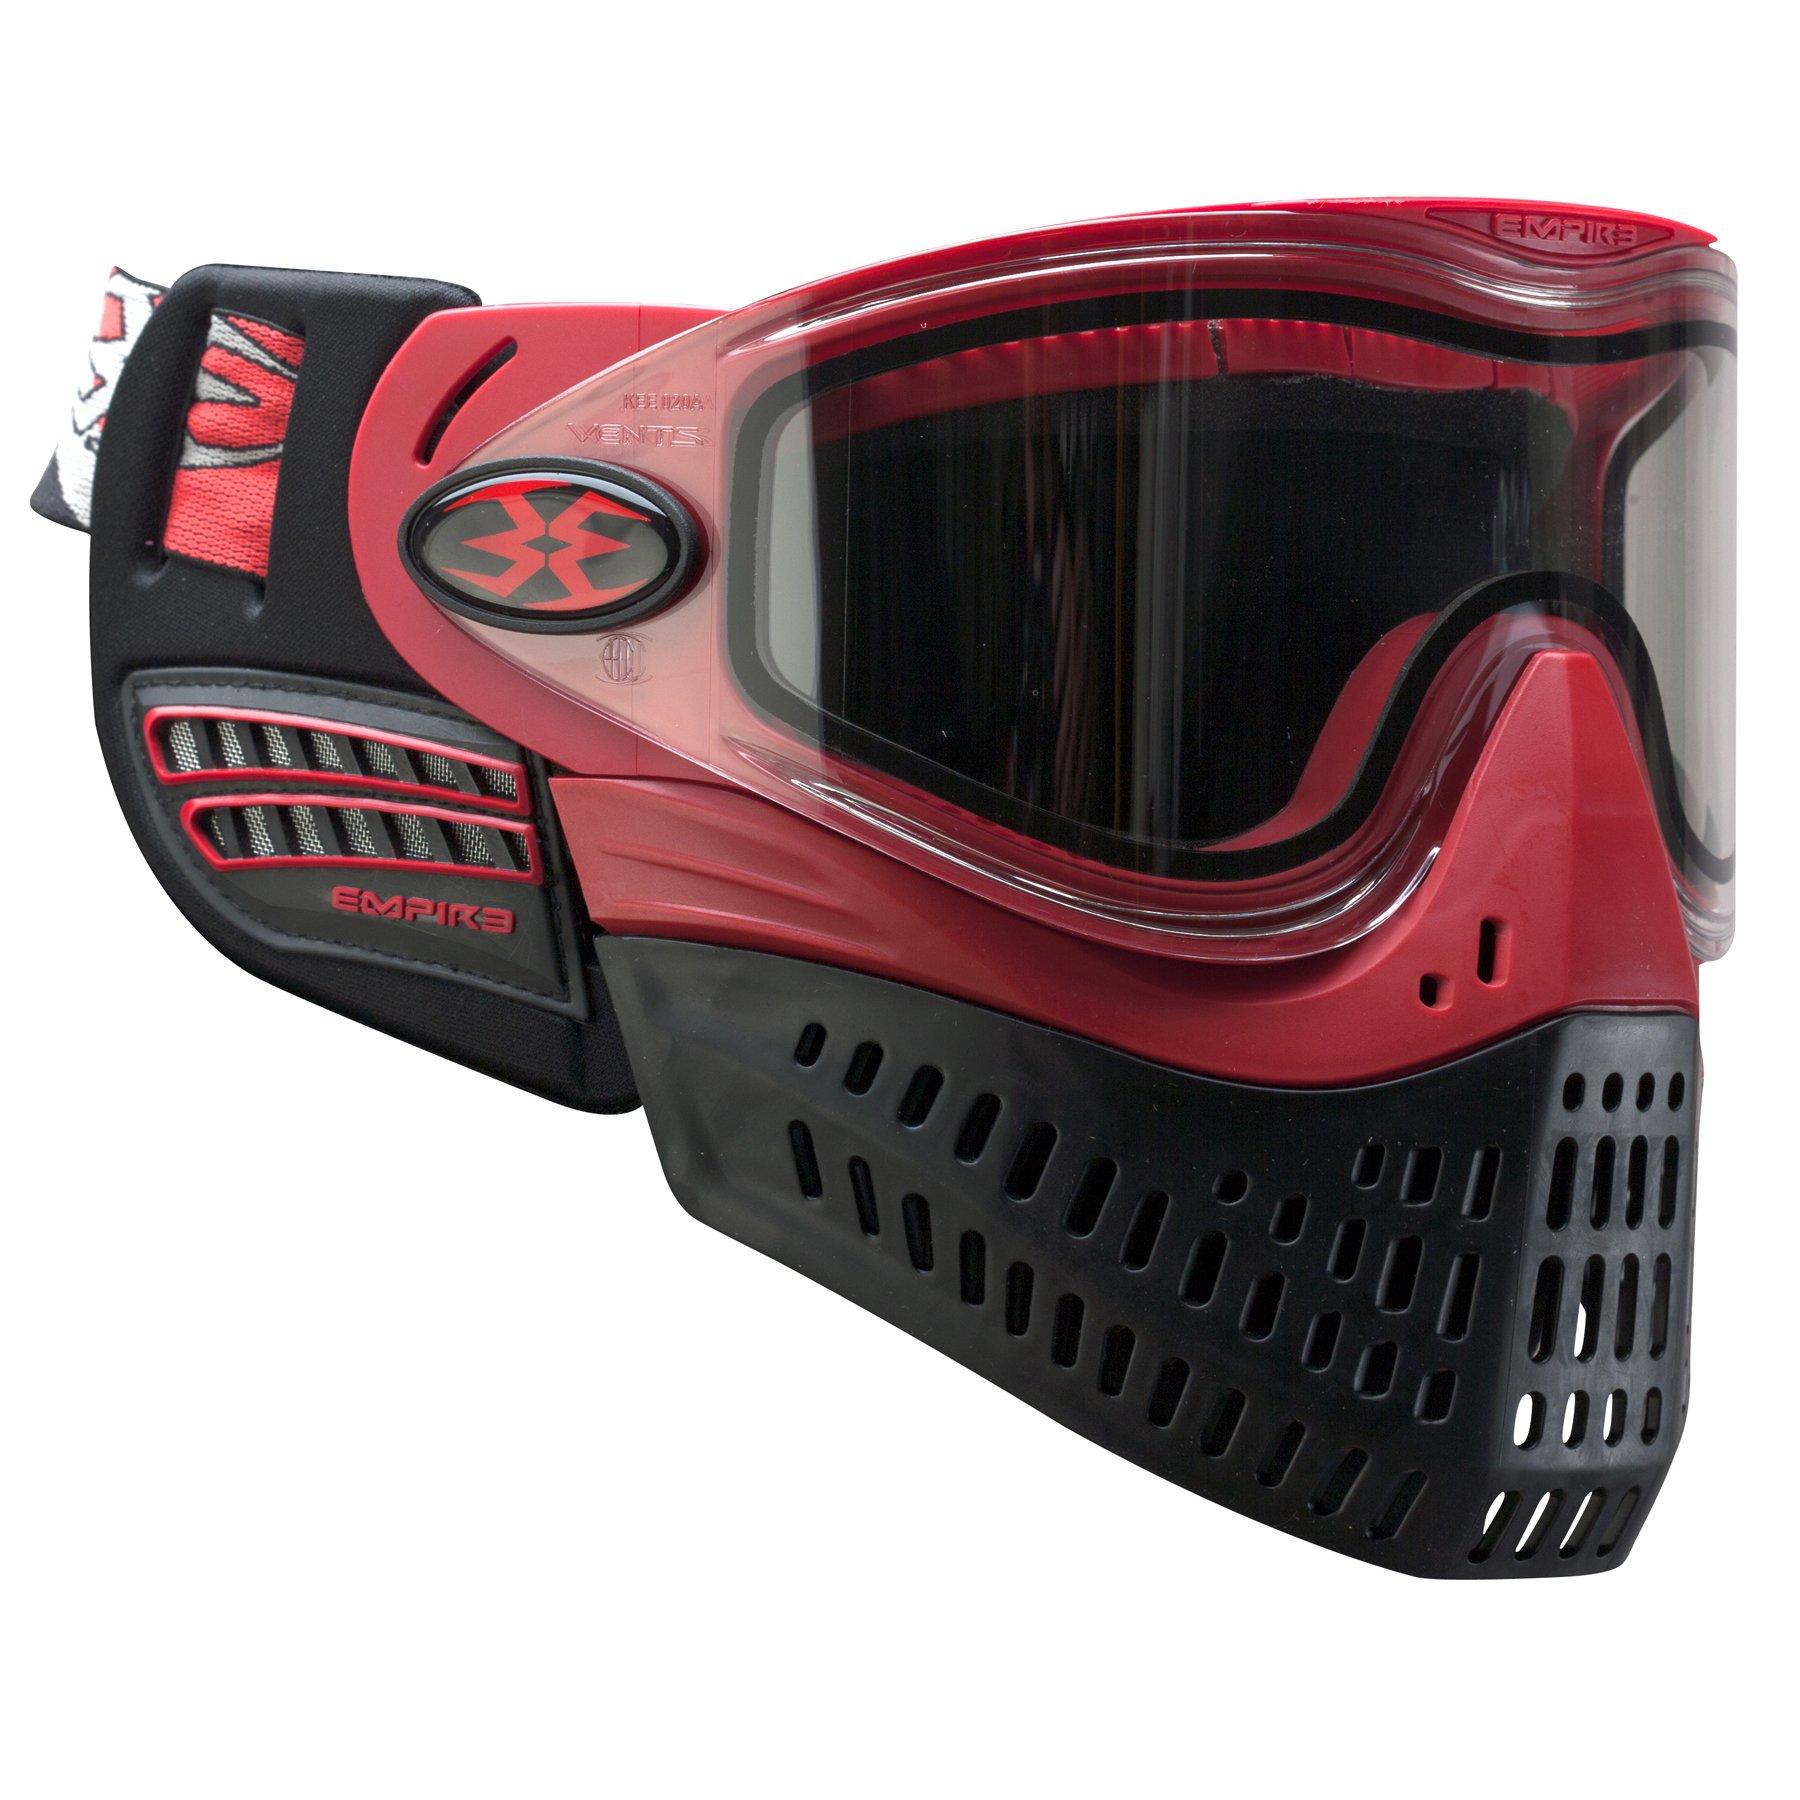 Empire Paintball e-Flex Goggle, Red